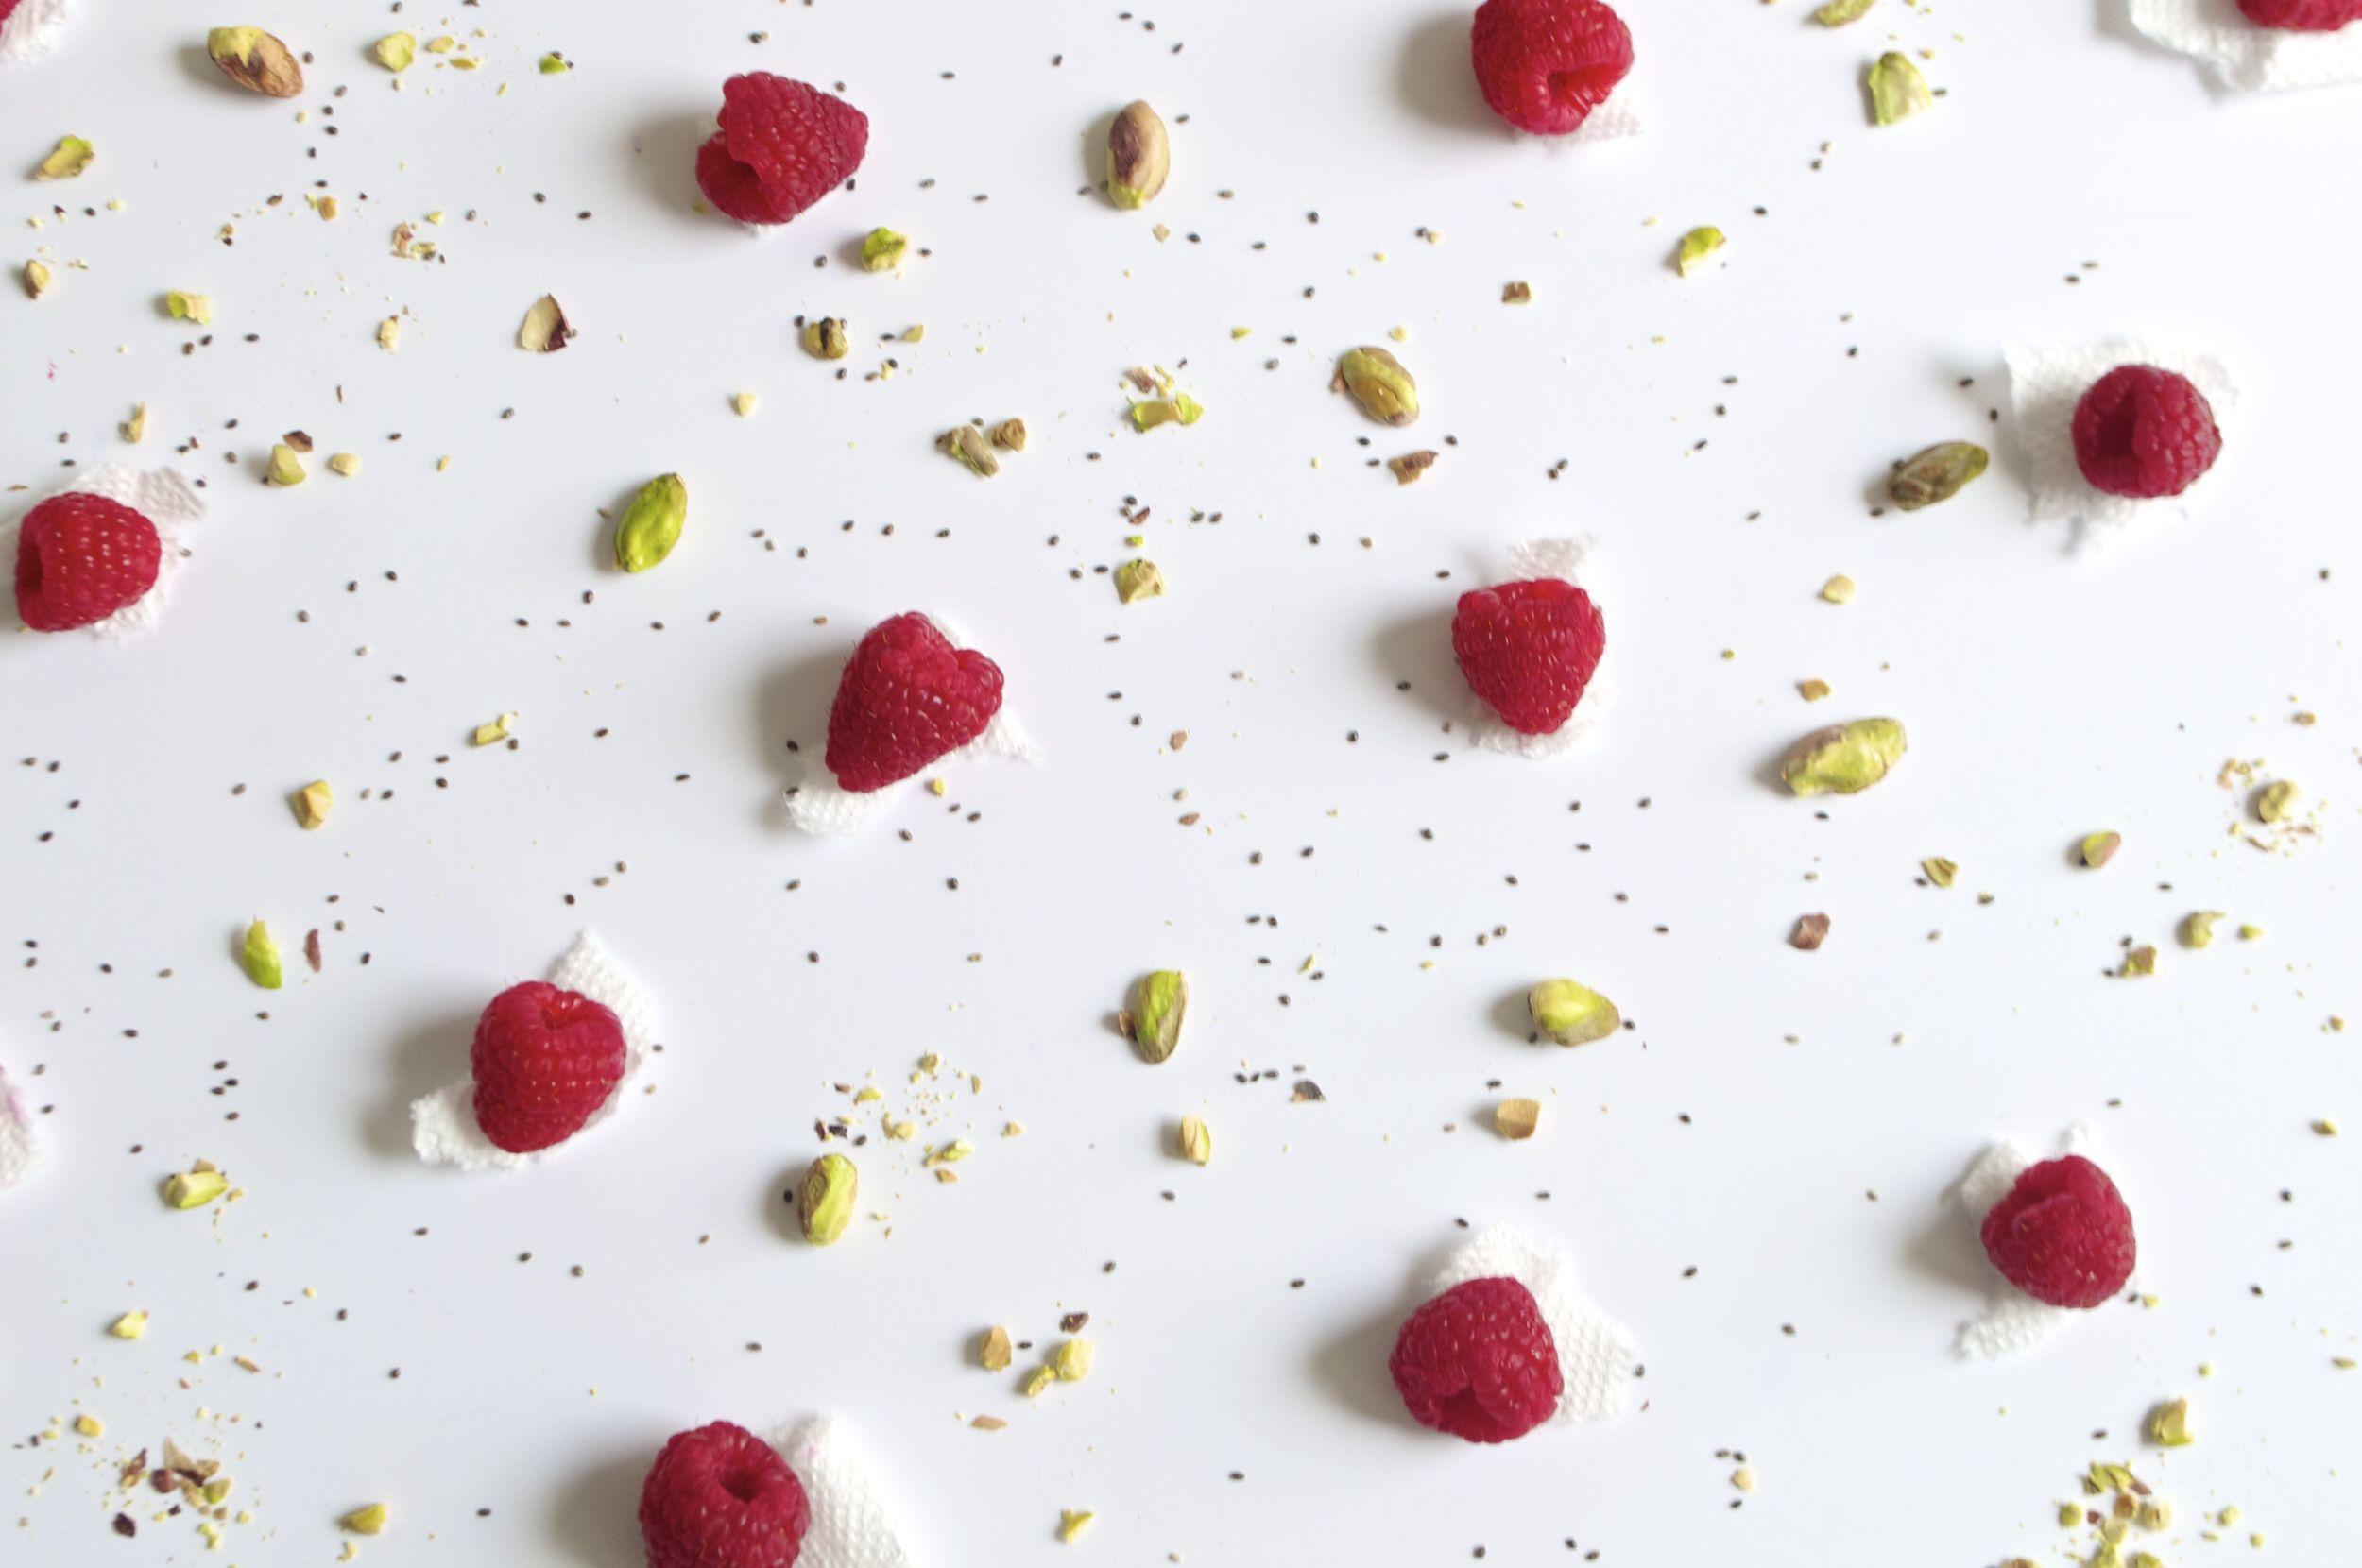 spiced-pistachio-cream-chia-pudding-vegan-fried-parsley